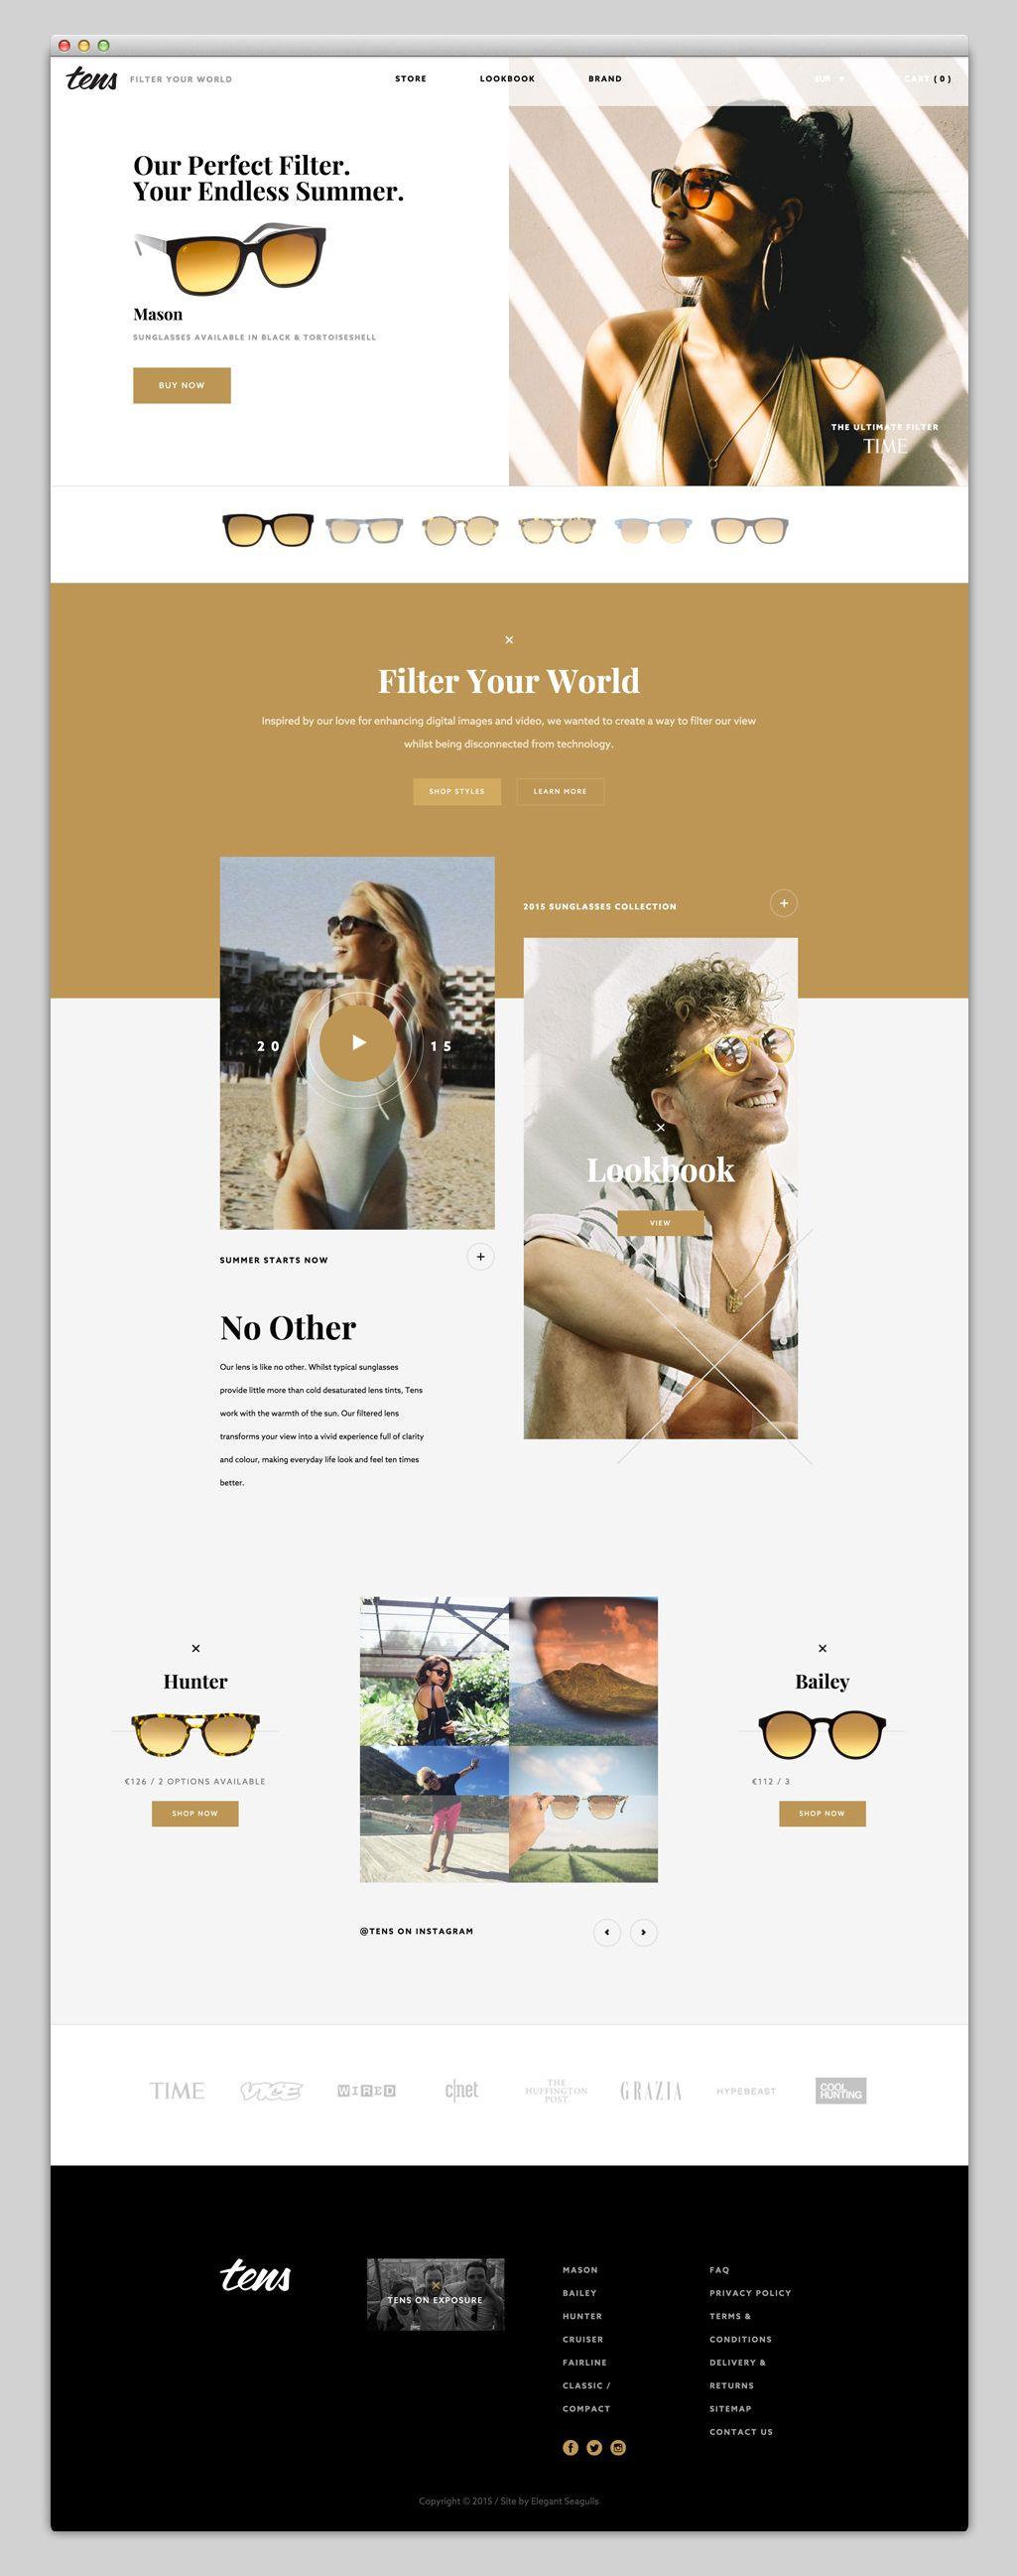 The Web Aesthetic Web Design Tips Web Layout Design Web Design Quotes